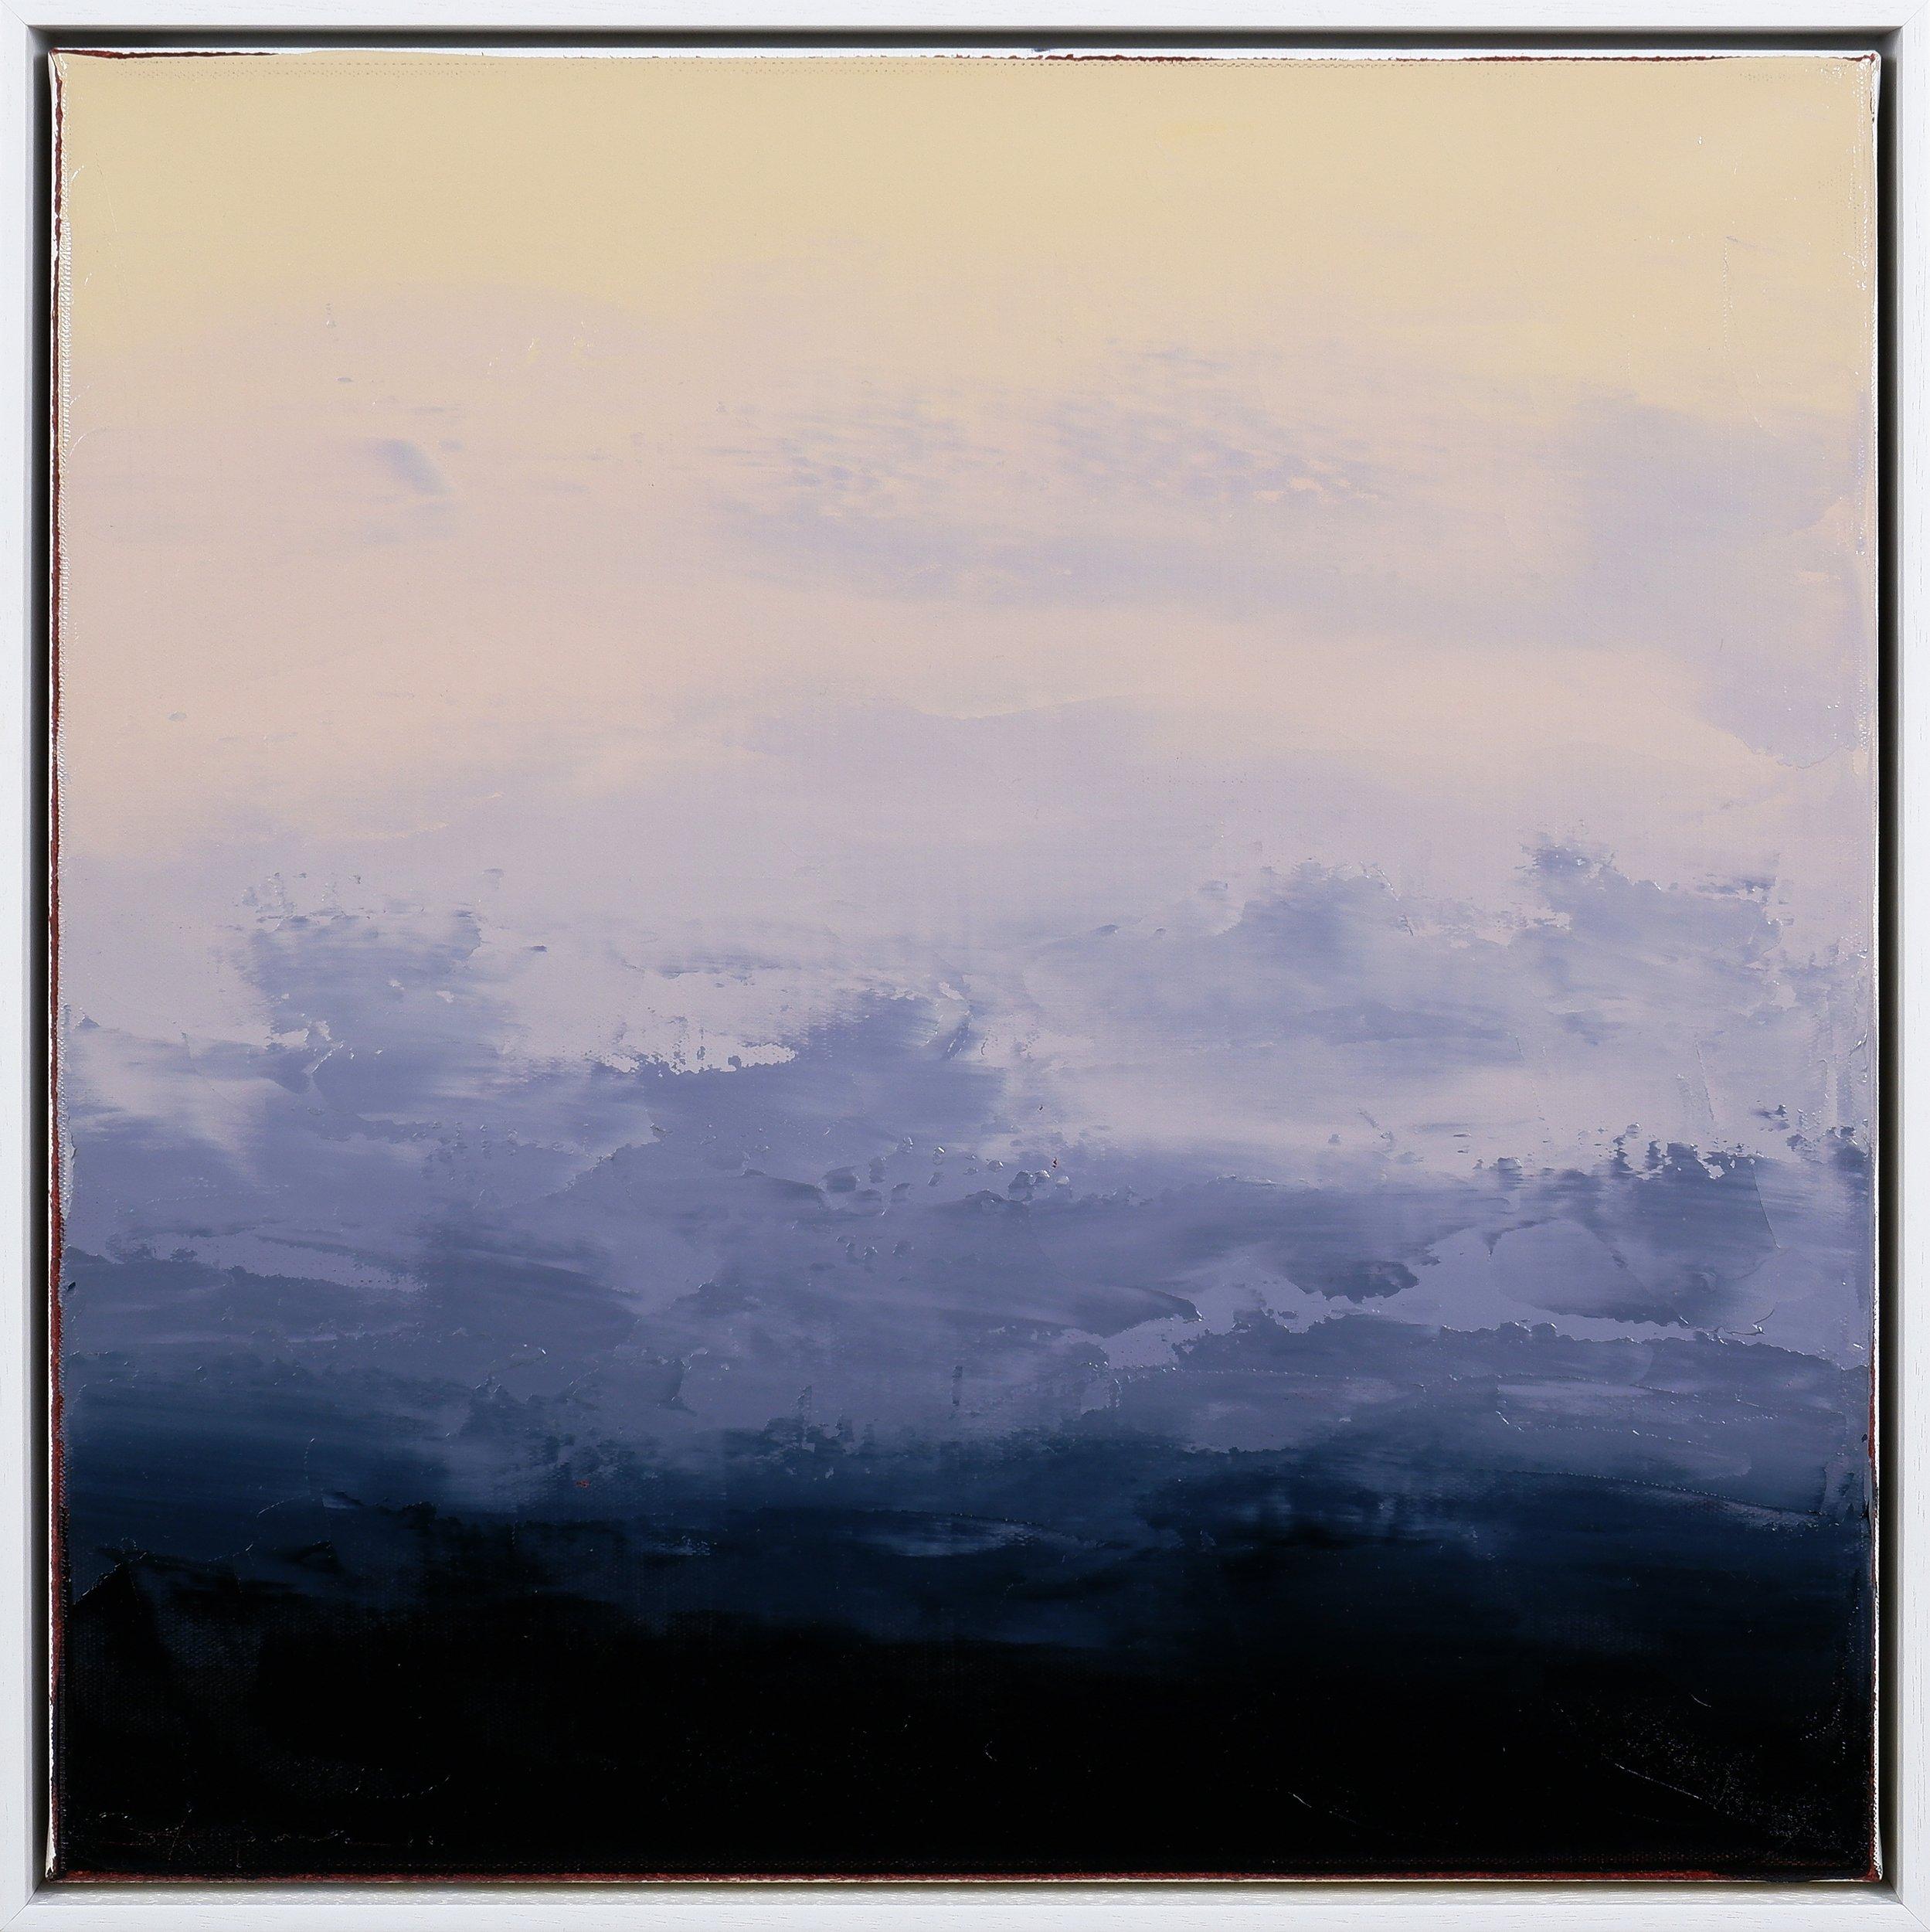 'Sokquon Tran (born 1969), Highlands Landscape II, Oil on Landscape'